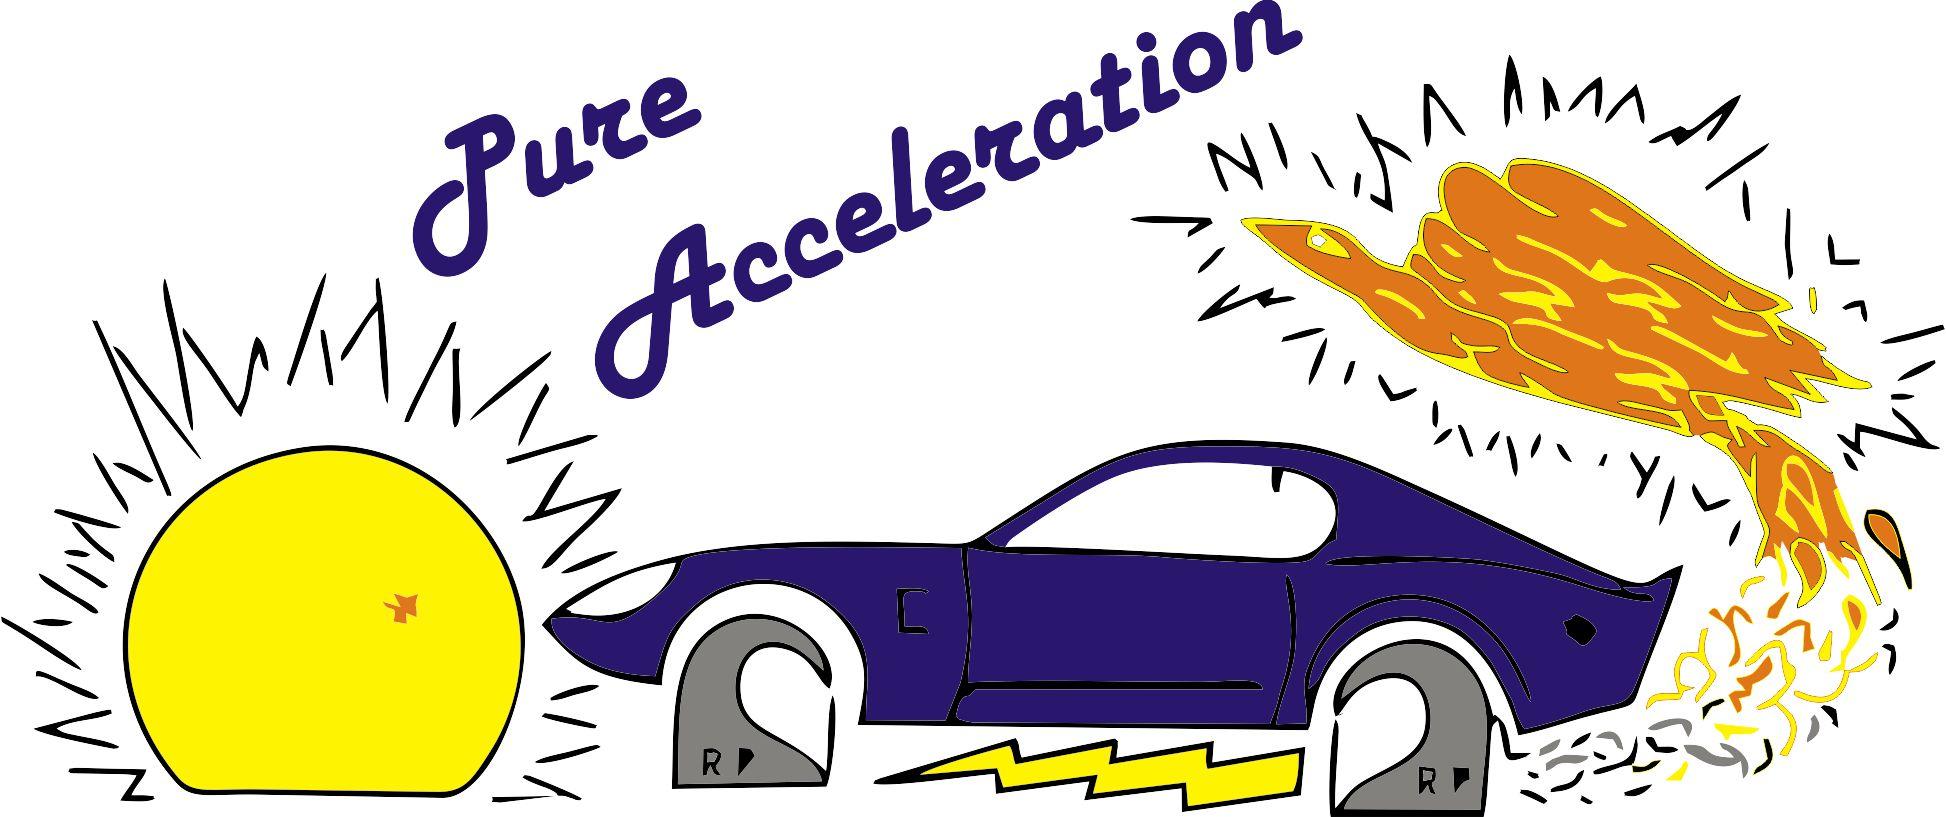 pureaccelerationlogo